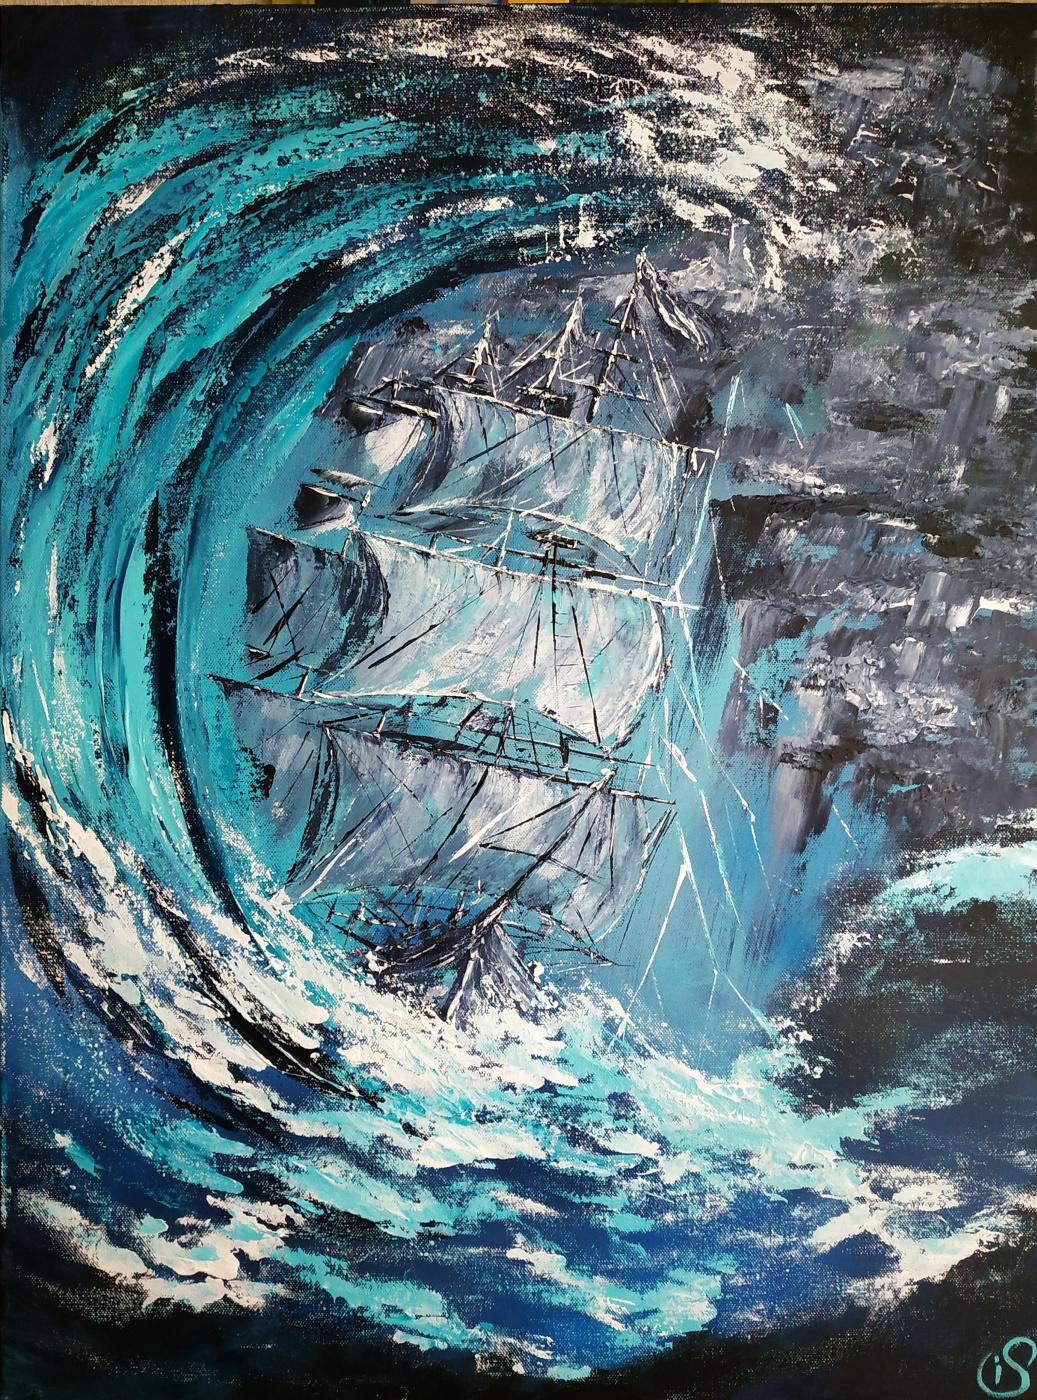 Irina Stukaneva. A big wave